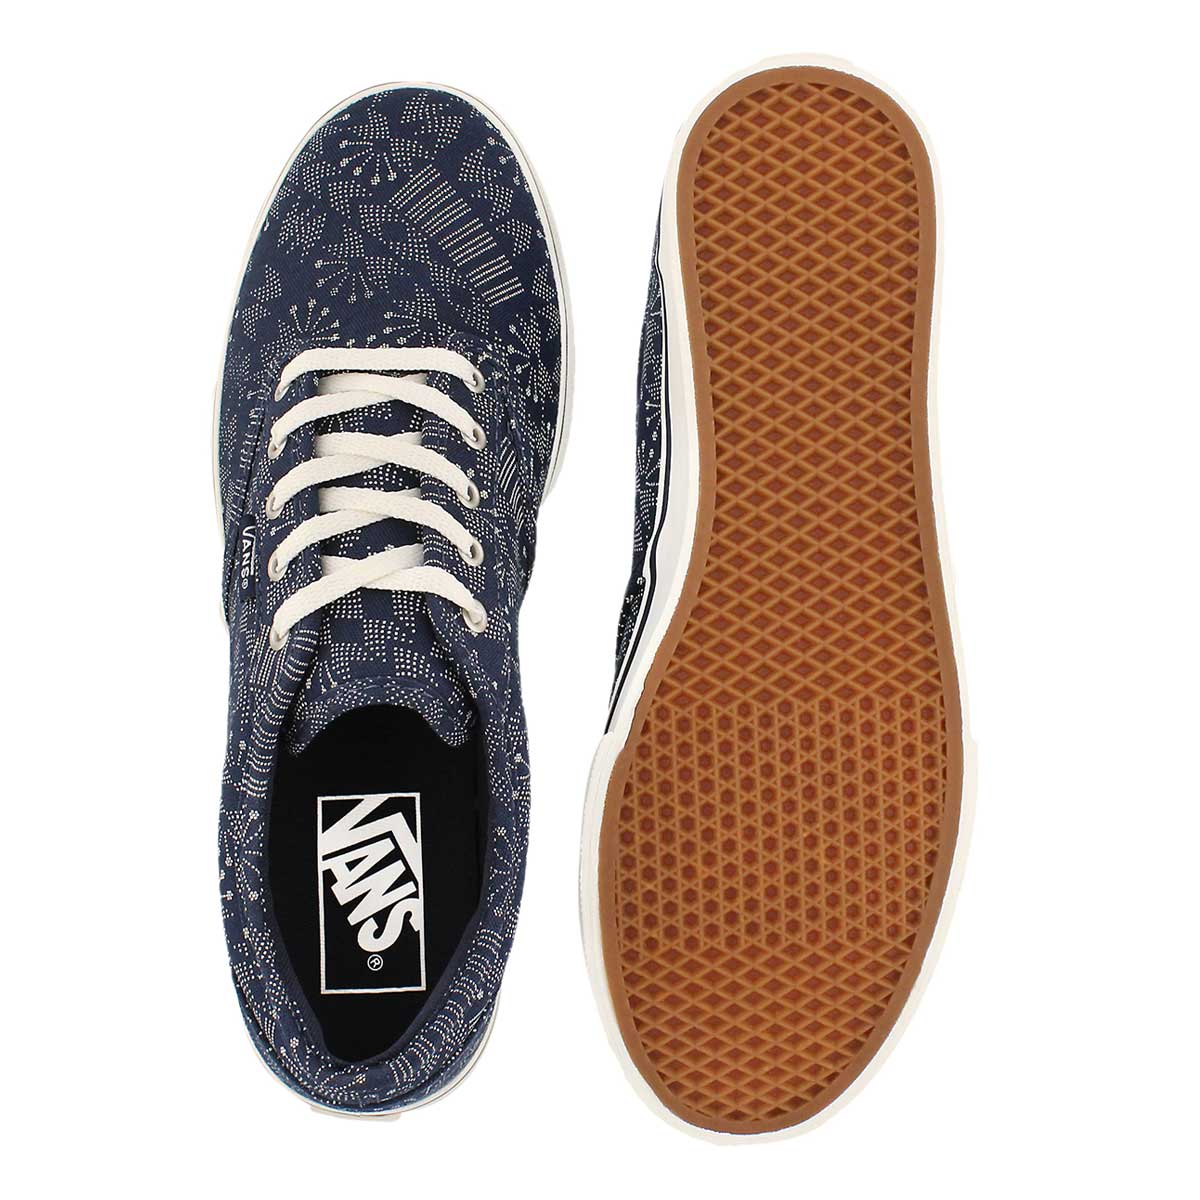 Lds Atwood Low indigo prt laceup sneaker